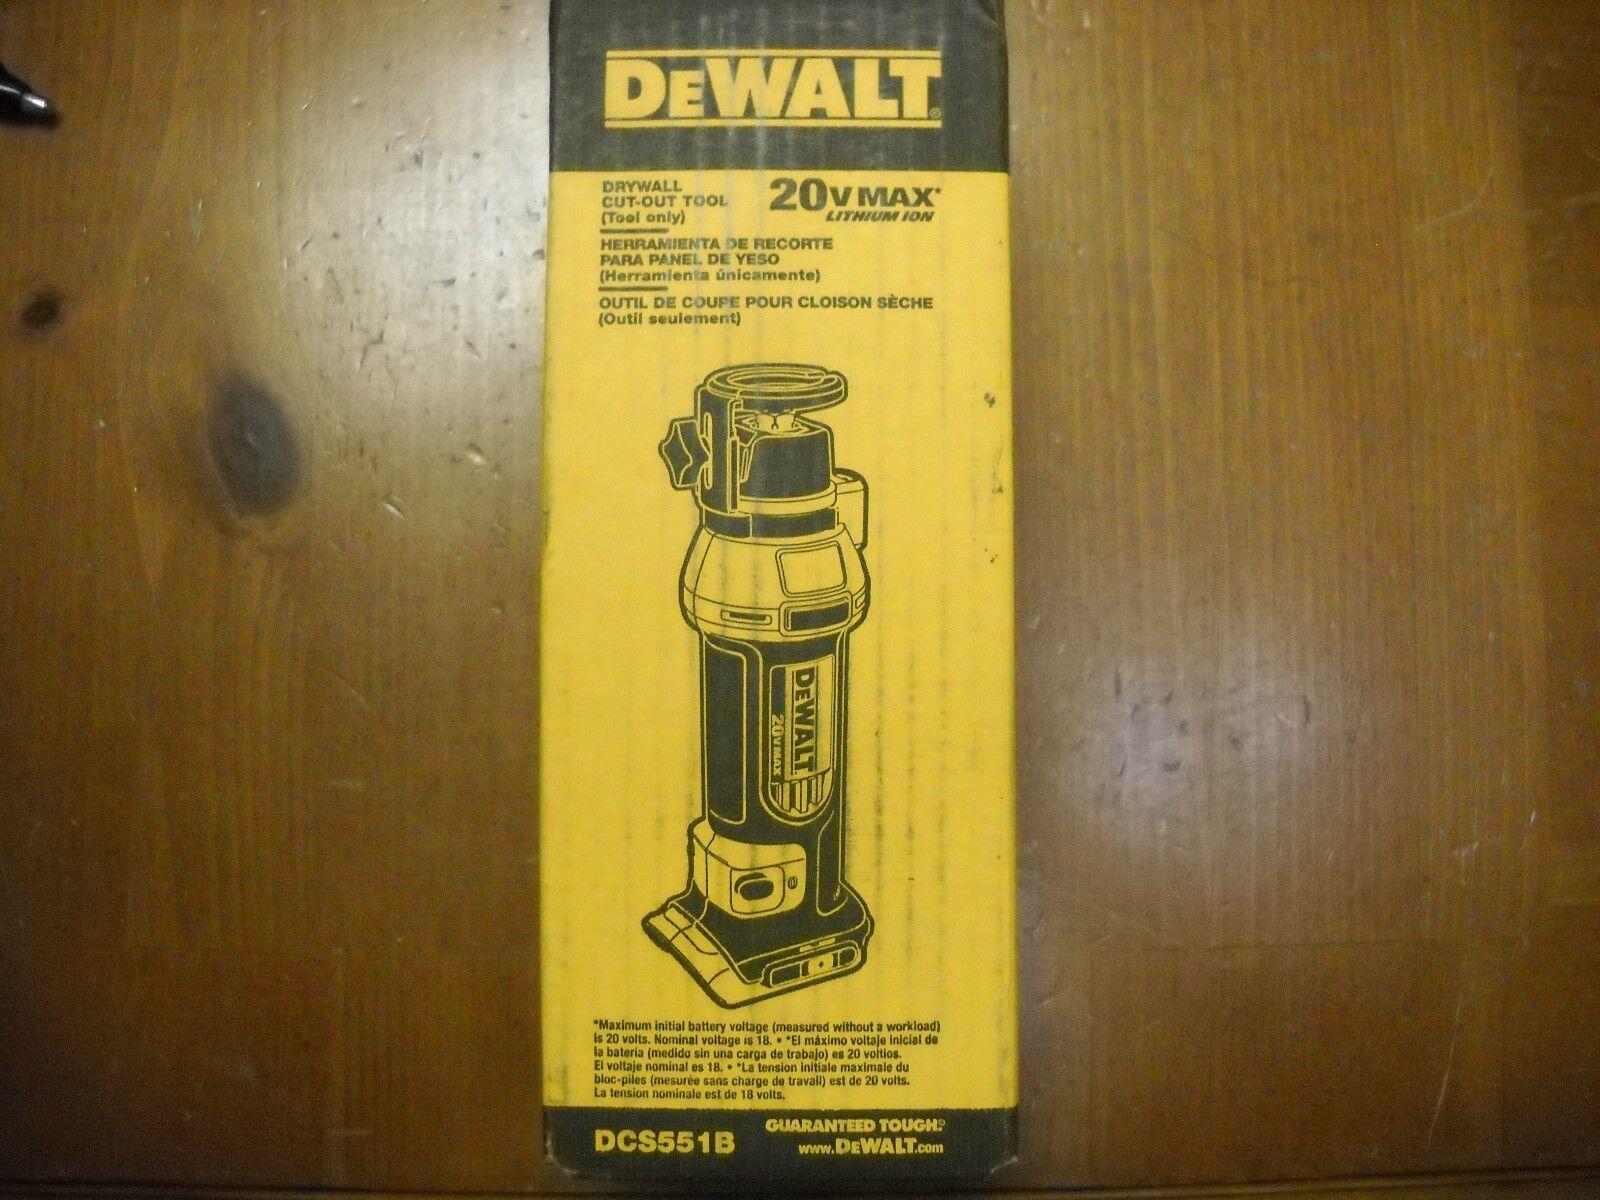 DEWALT DCS551B 20V MAX Drywall Cut-Out Tool Bare Tool NEW